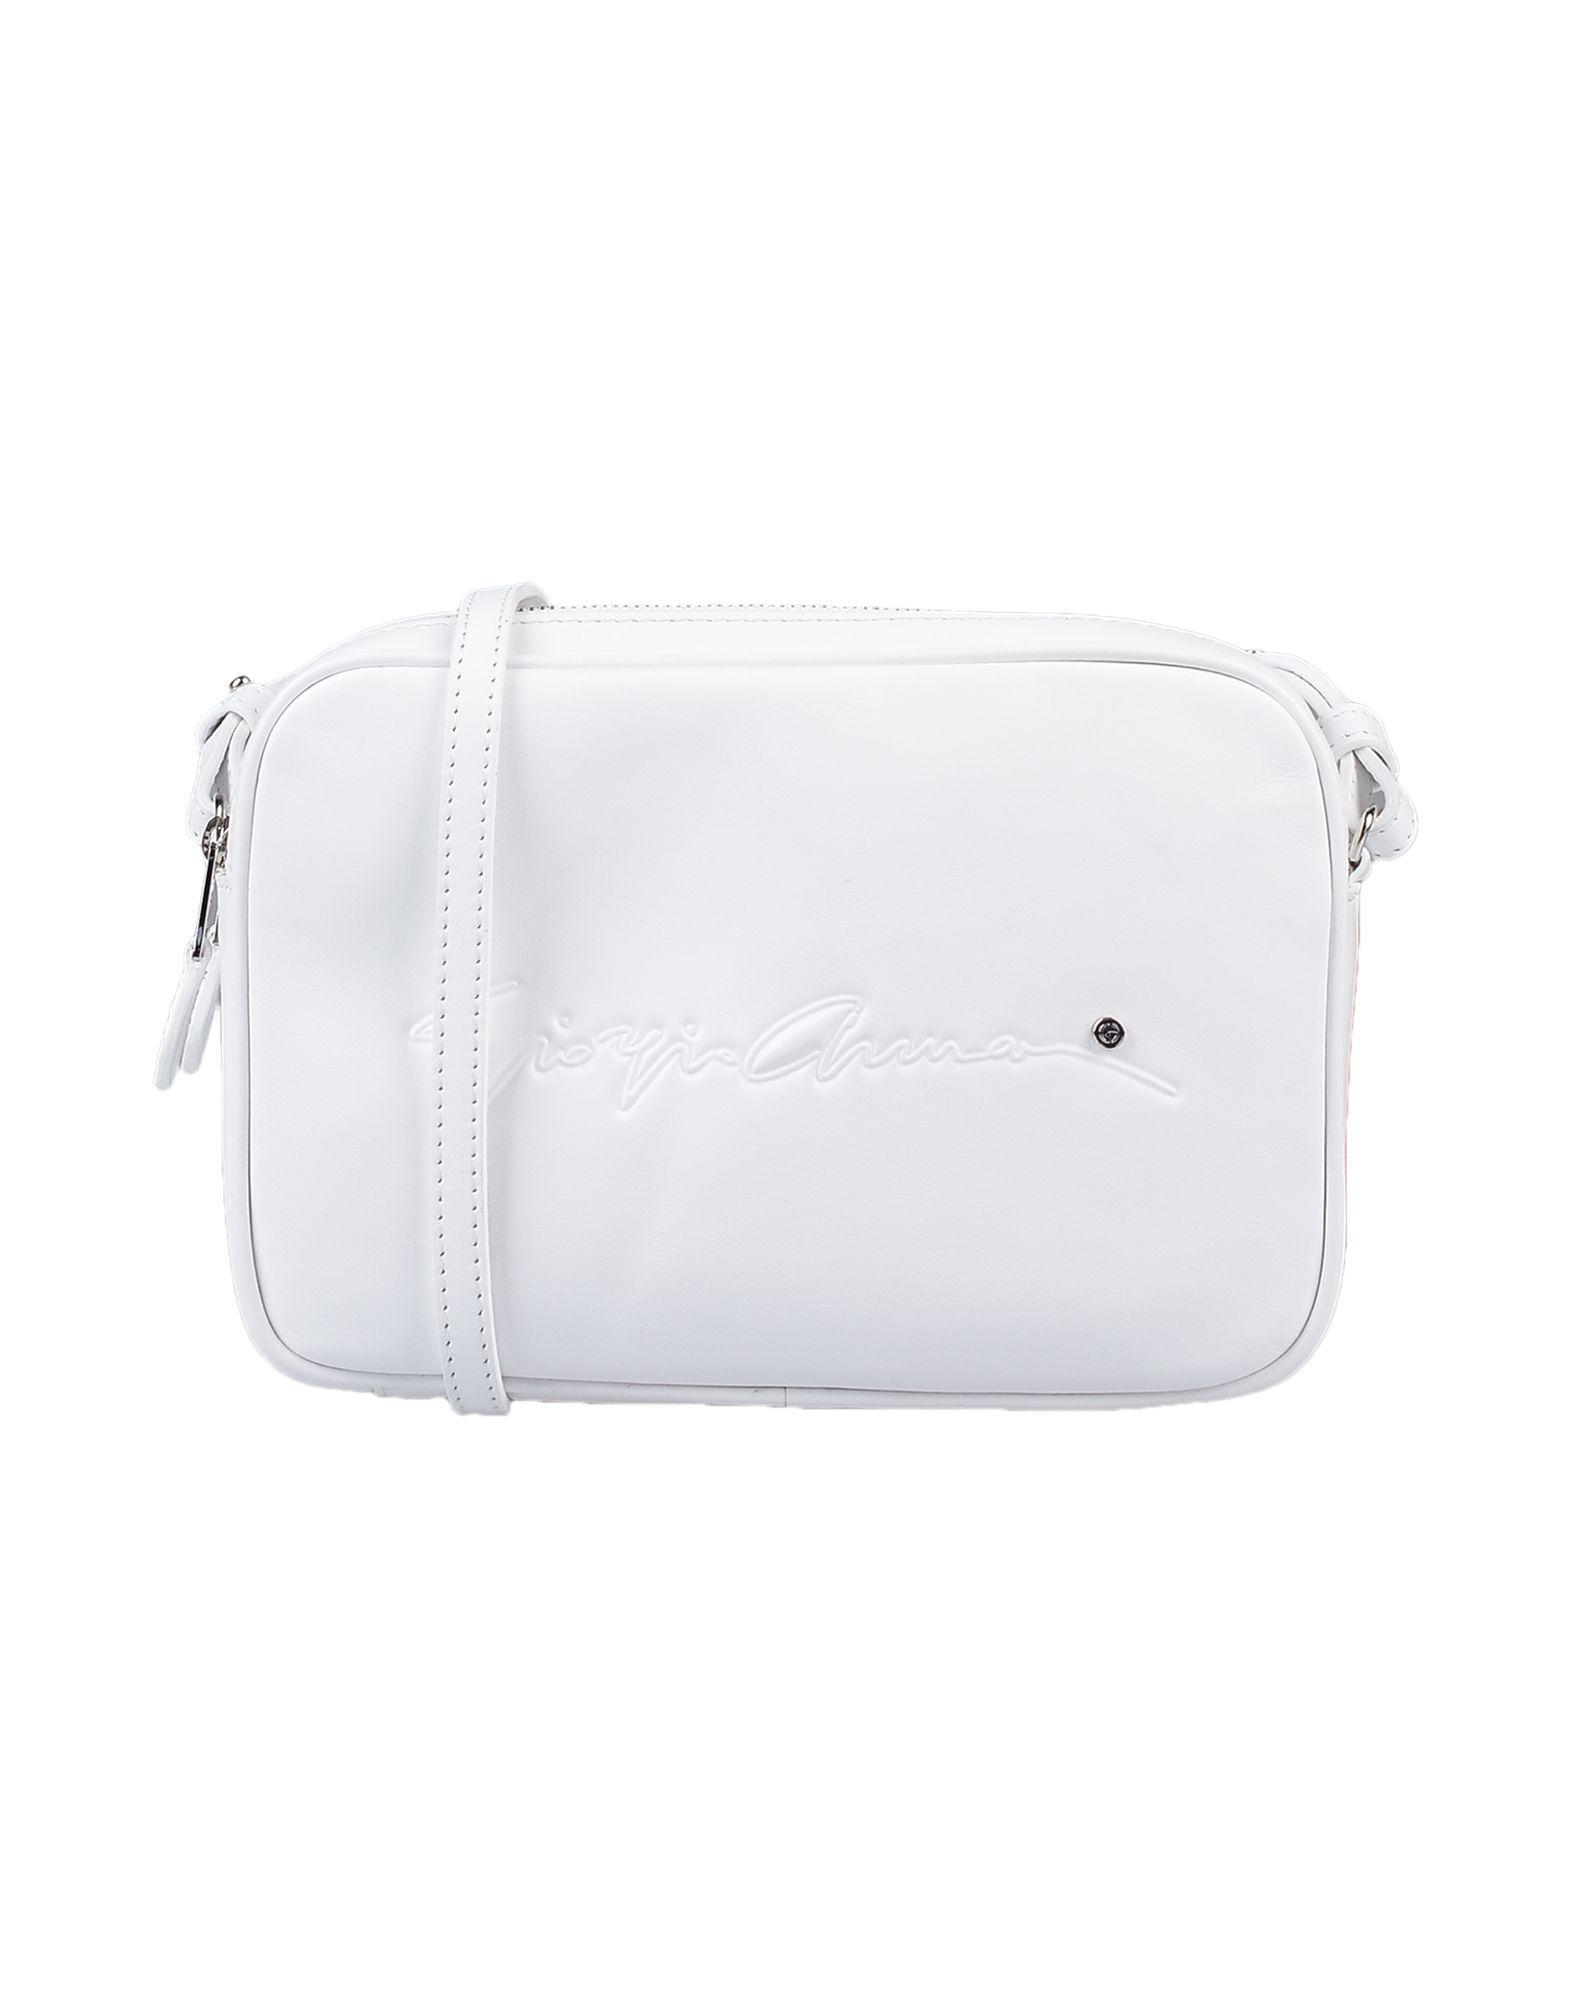 Bandoulière Giorgio Coloris Sacs Blanc En Lyst Armani 4apBqnw c0e077dddbd1